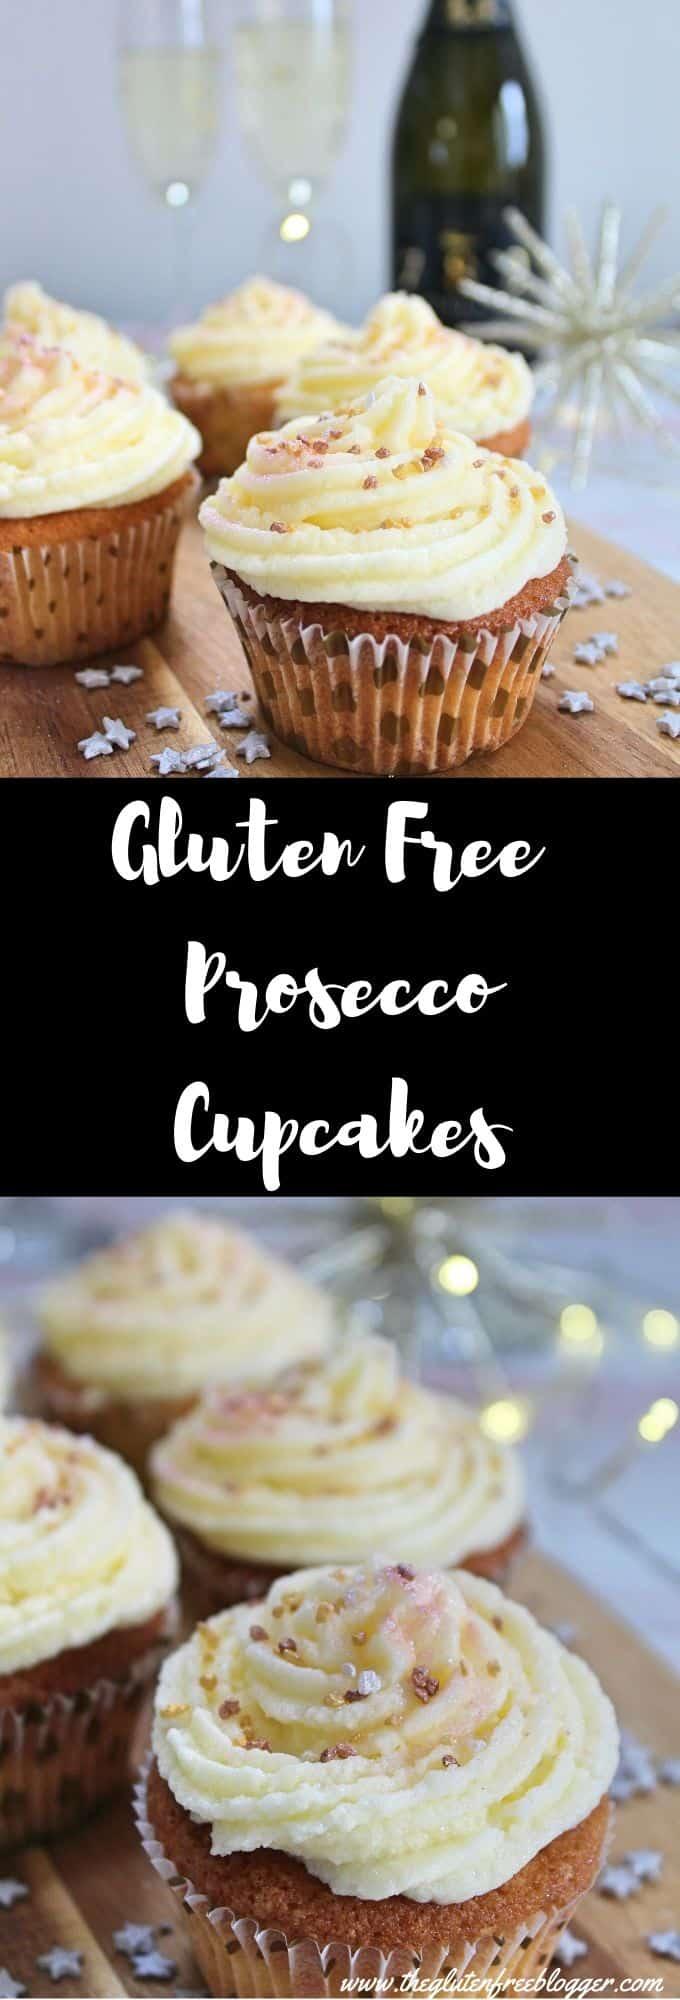 gluten free prosecco cupcakes recipe - christmas new year party bakes ideas cake coeliac friendly